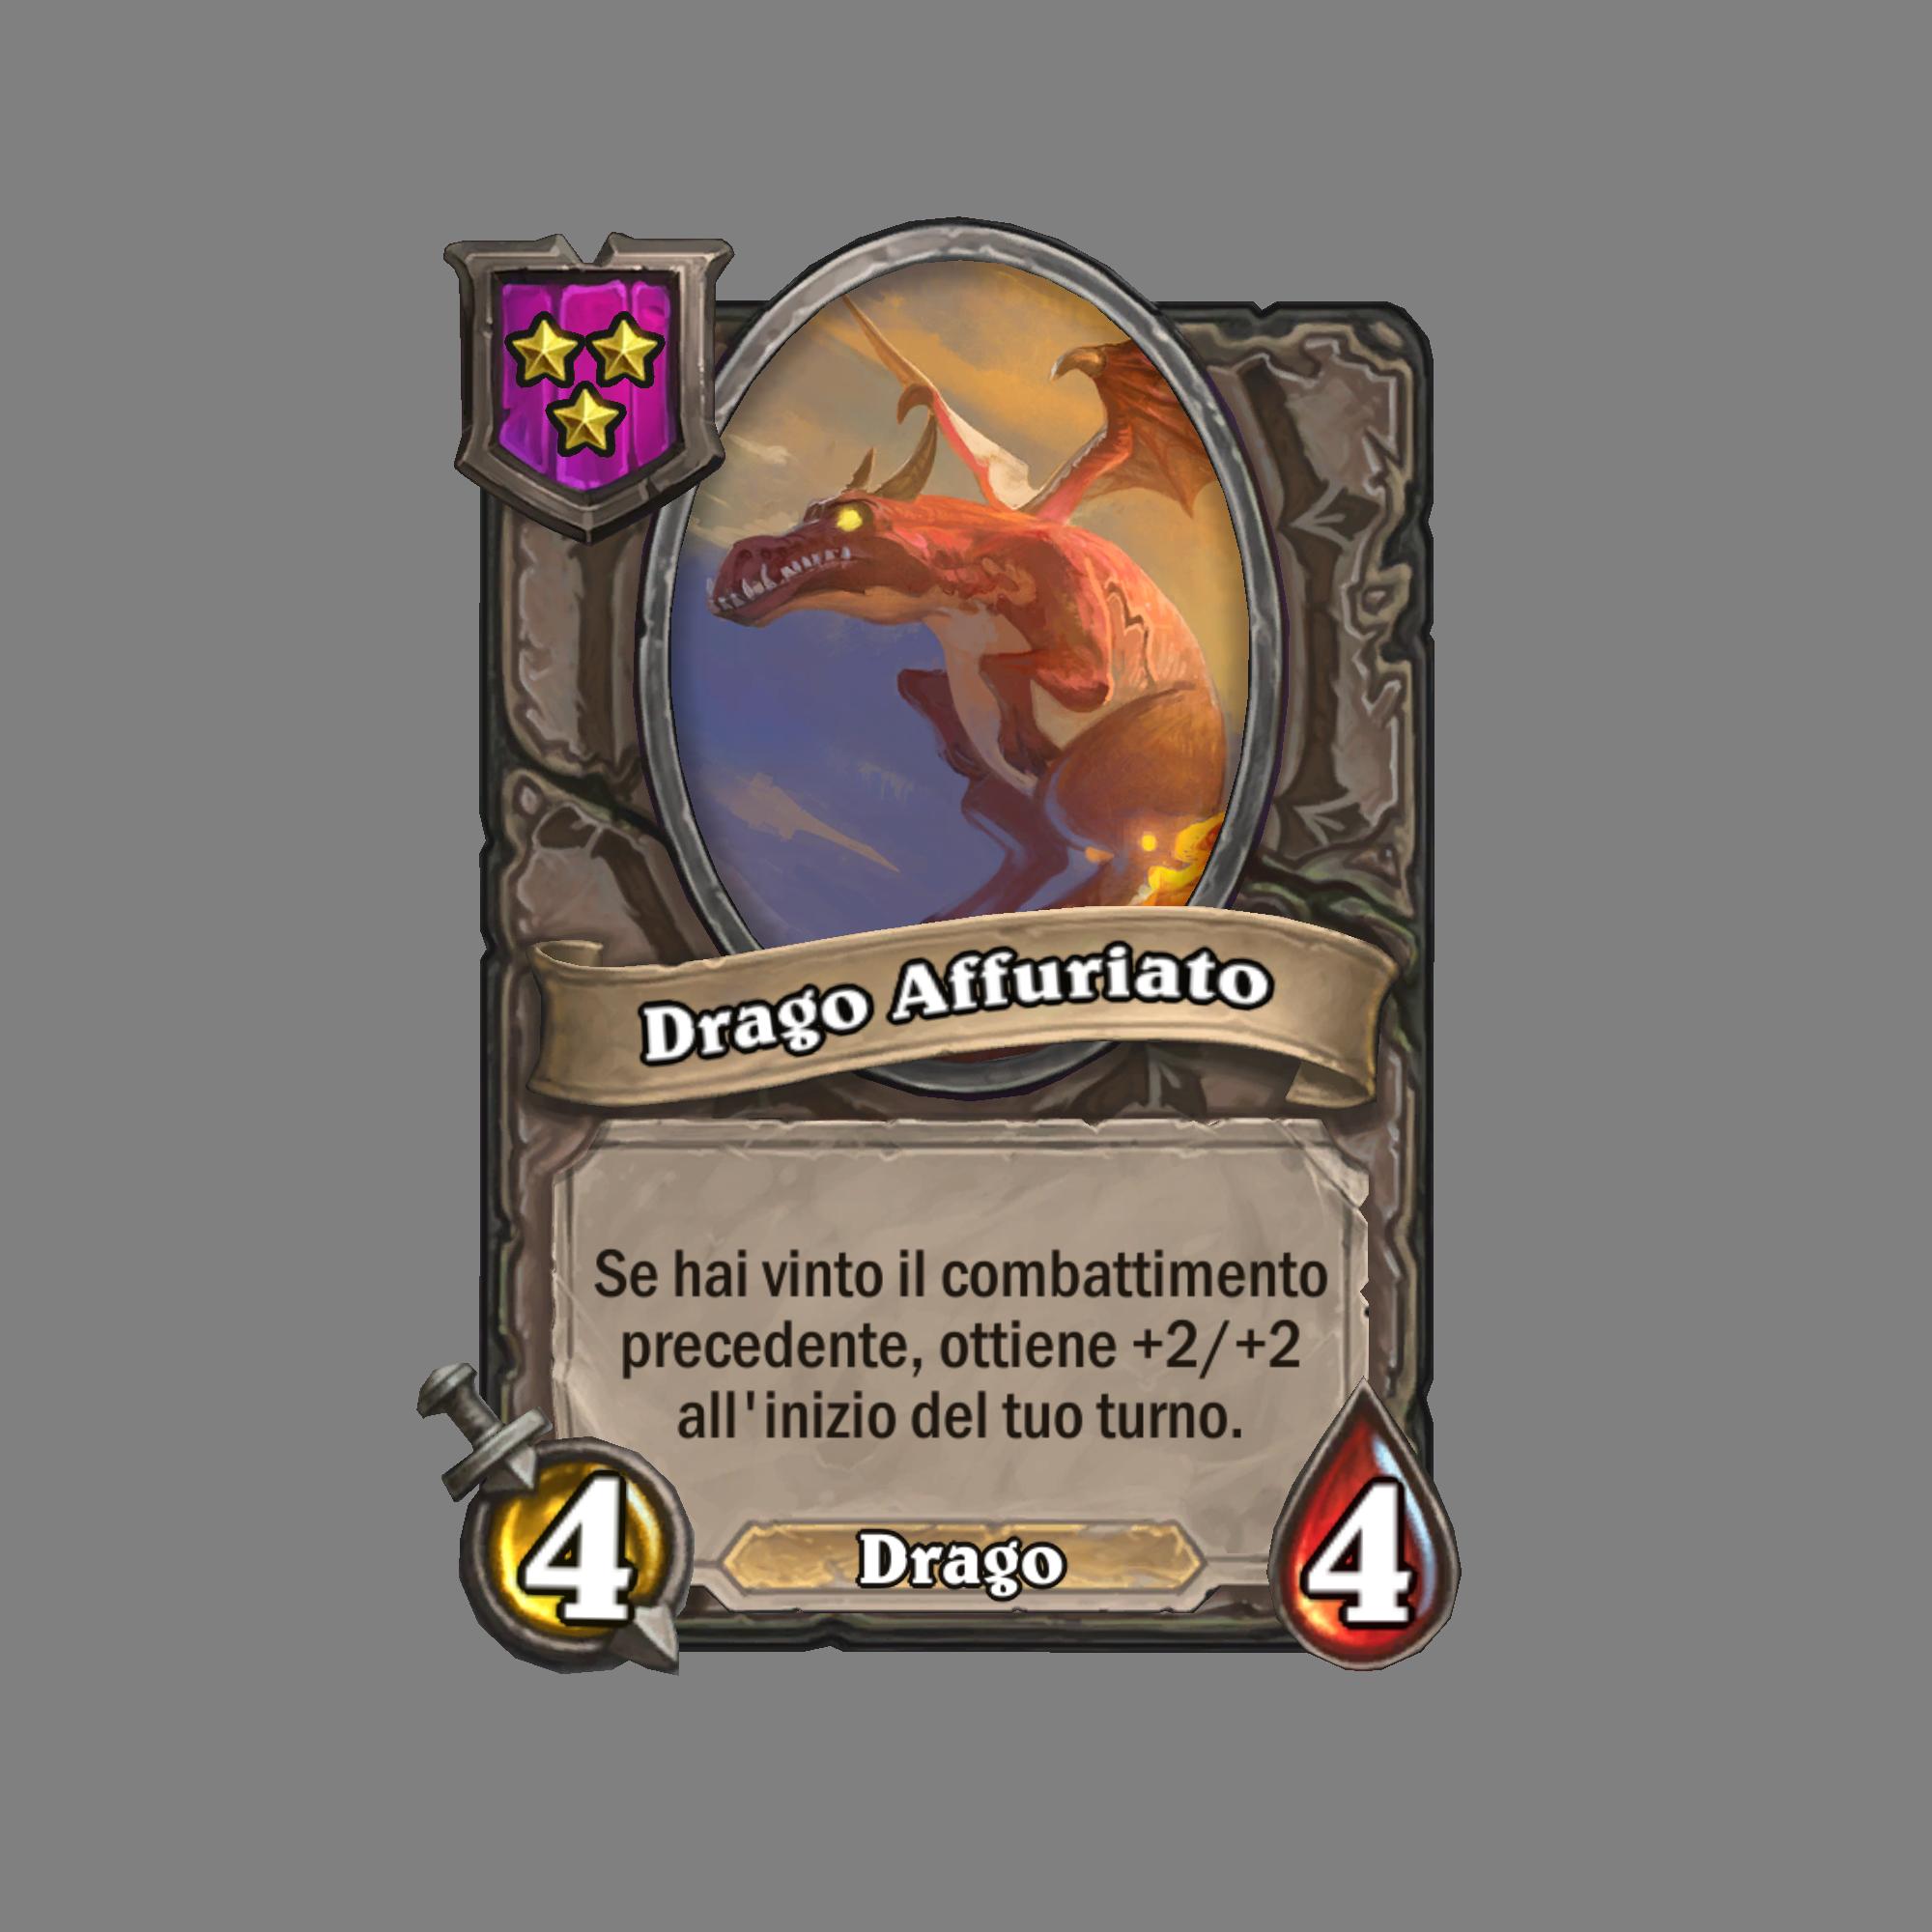 Drago Affuriato